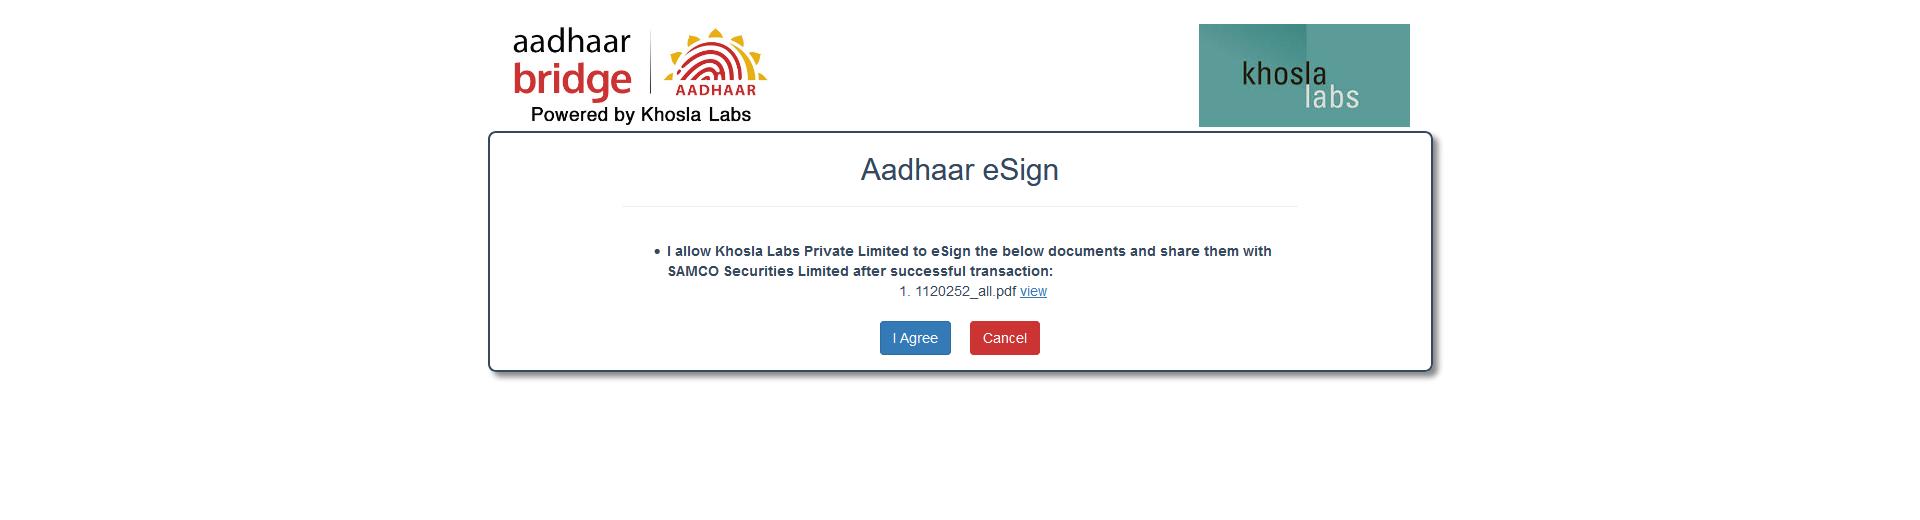 samco-account-aadhar confirmation